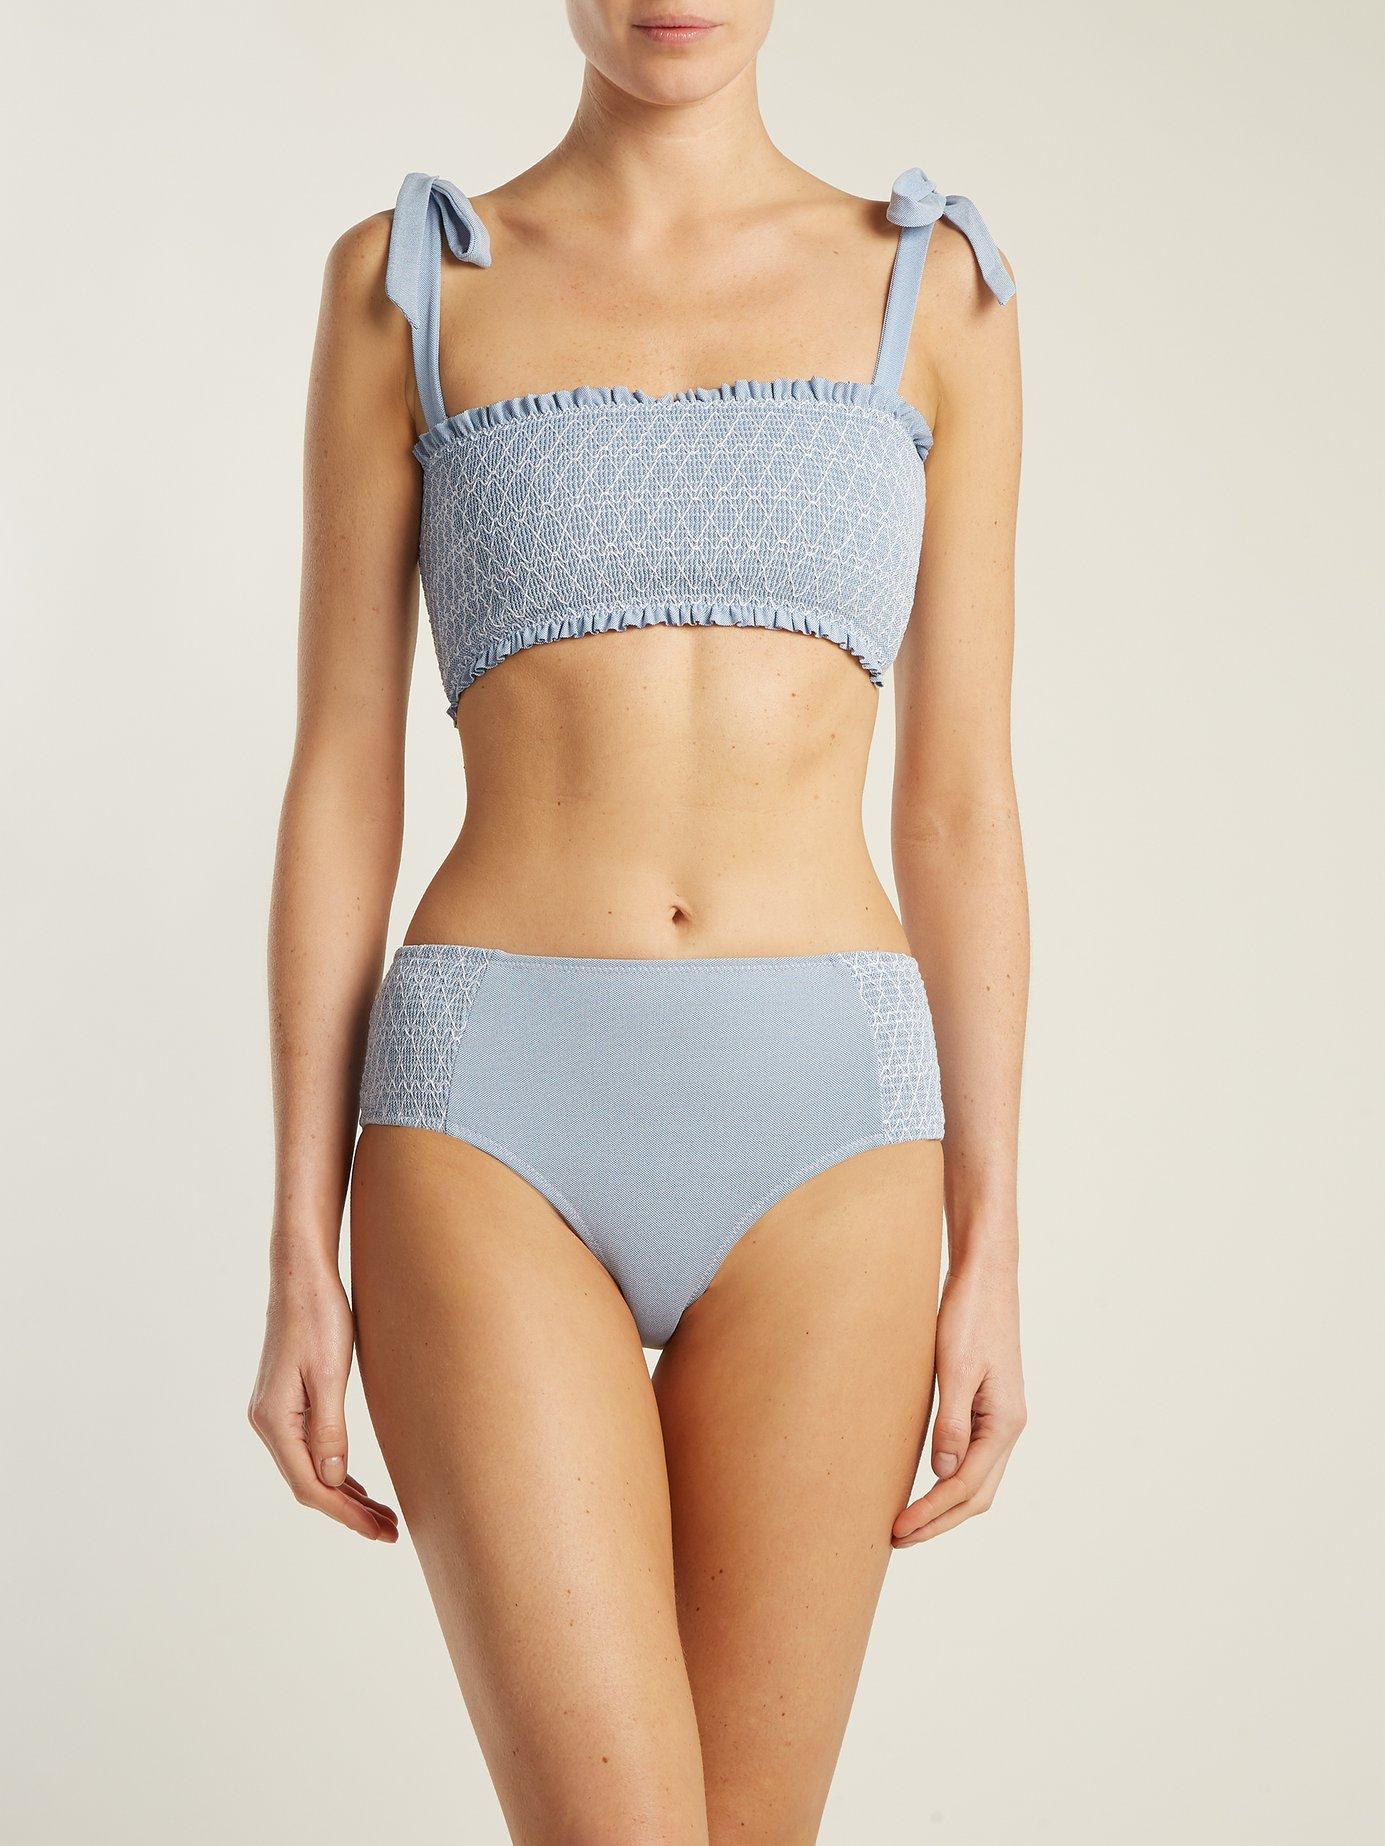 Cassis high-waisted bikini briefs by Heidi Klein